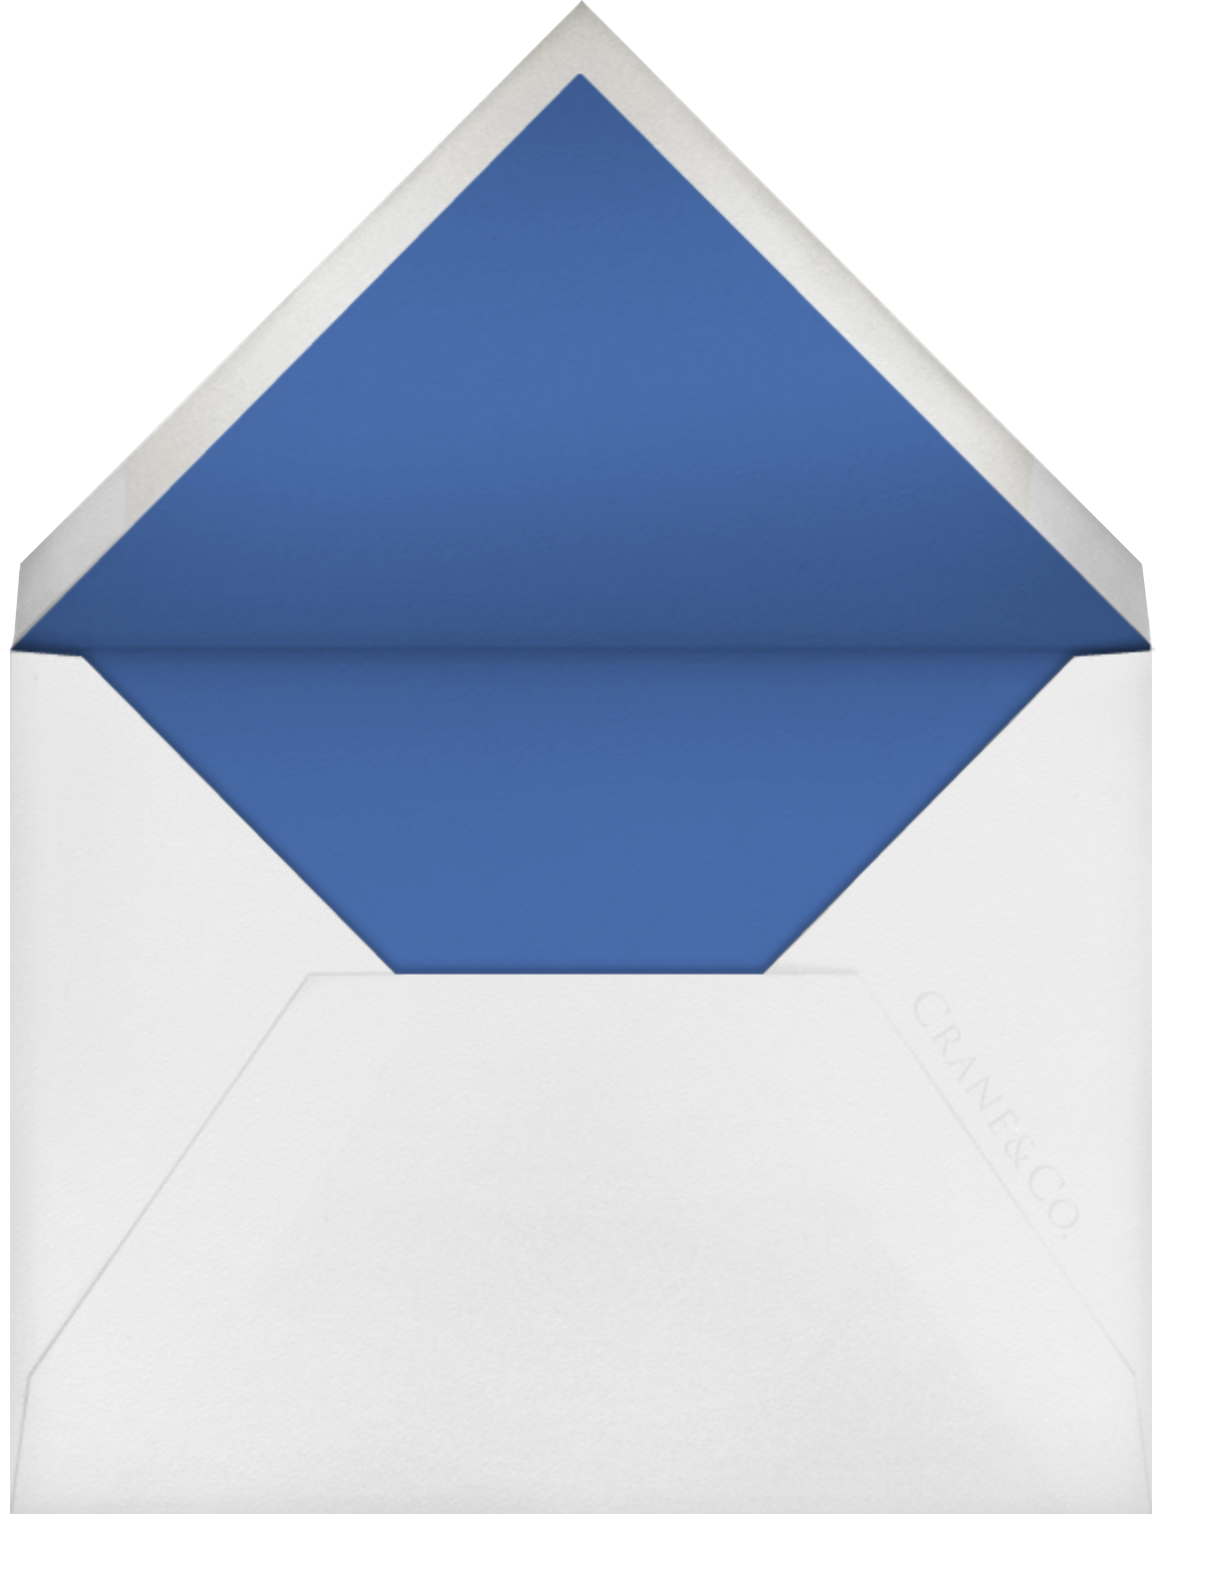 Cheverny (Thank You) - Regent Blue - Crane & Co. - Personalized stationery - envelope back